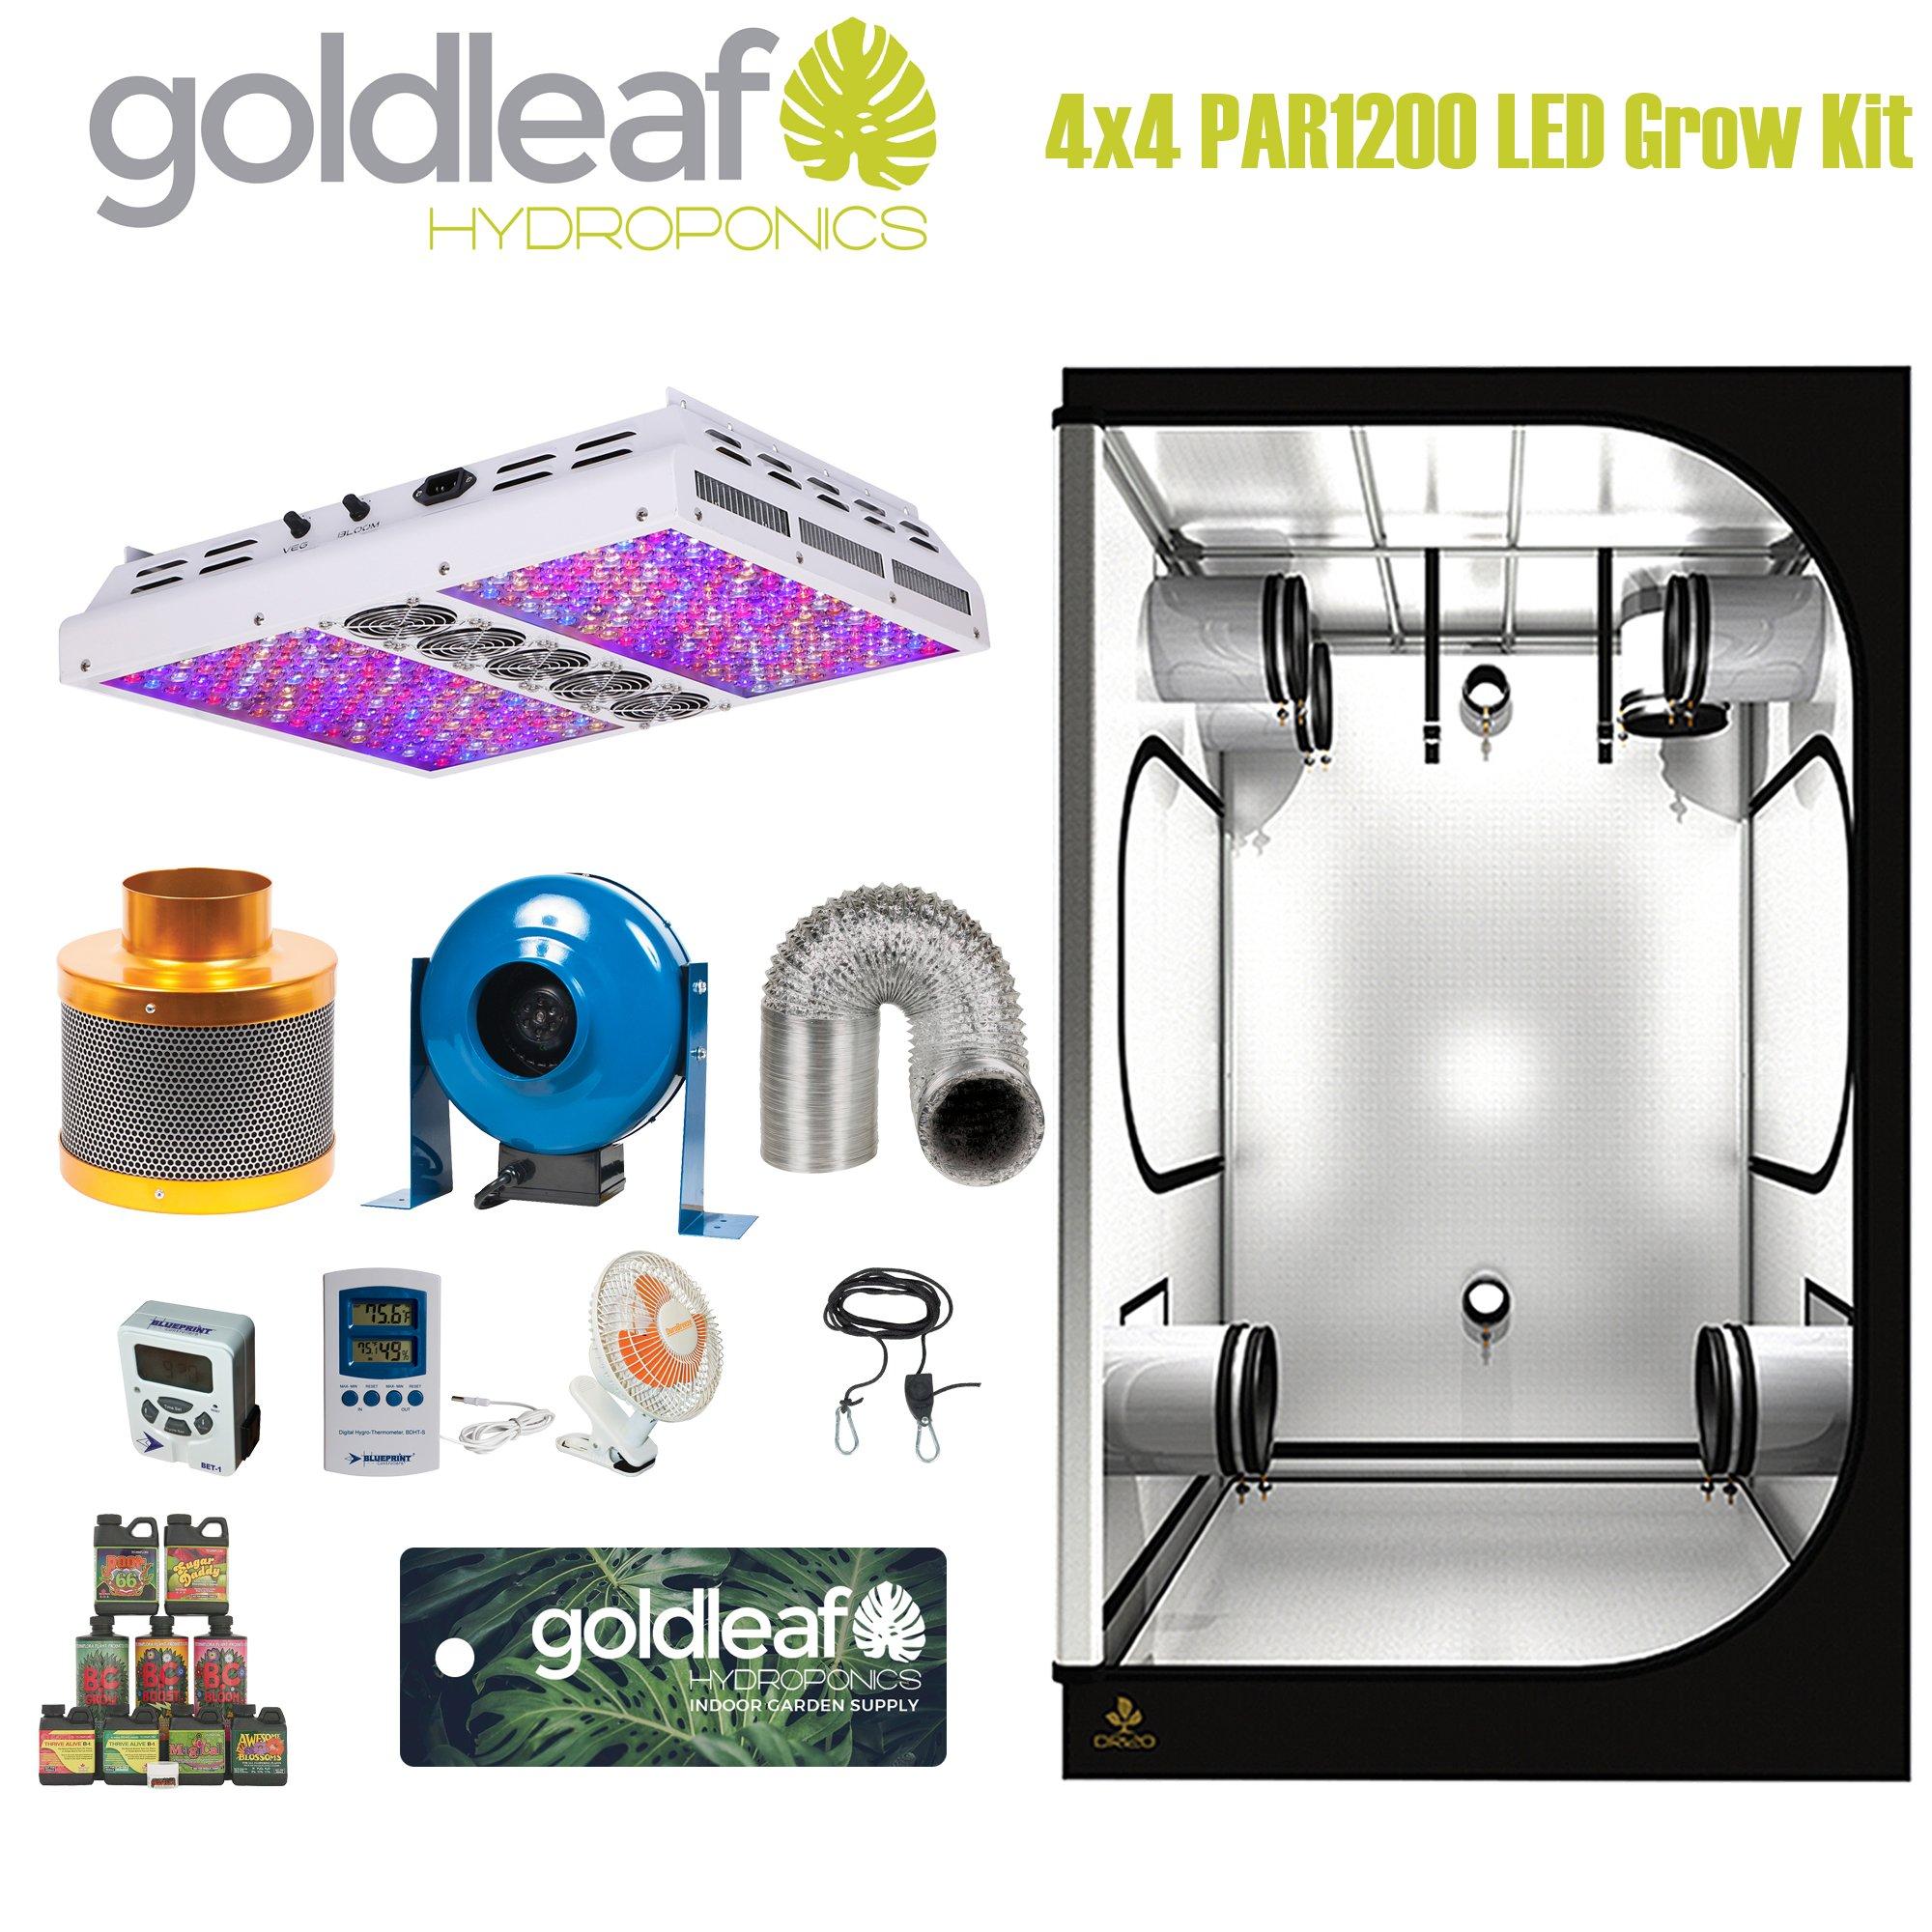 Complete 4 x 4 Grow Tent Kit w/ PAR1200 LED light, fan, carbon filter and more by Goldleaf Hydroponics